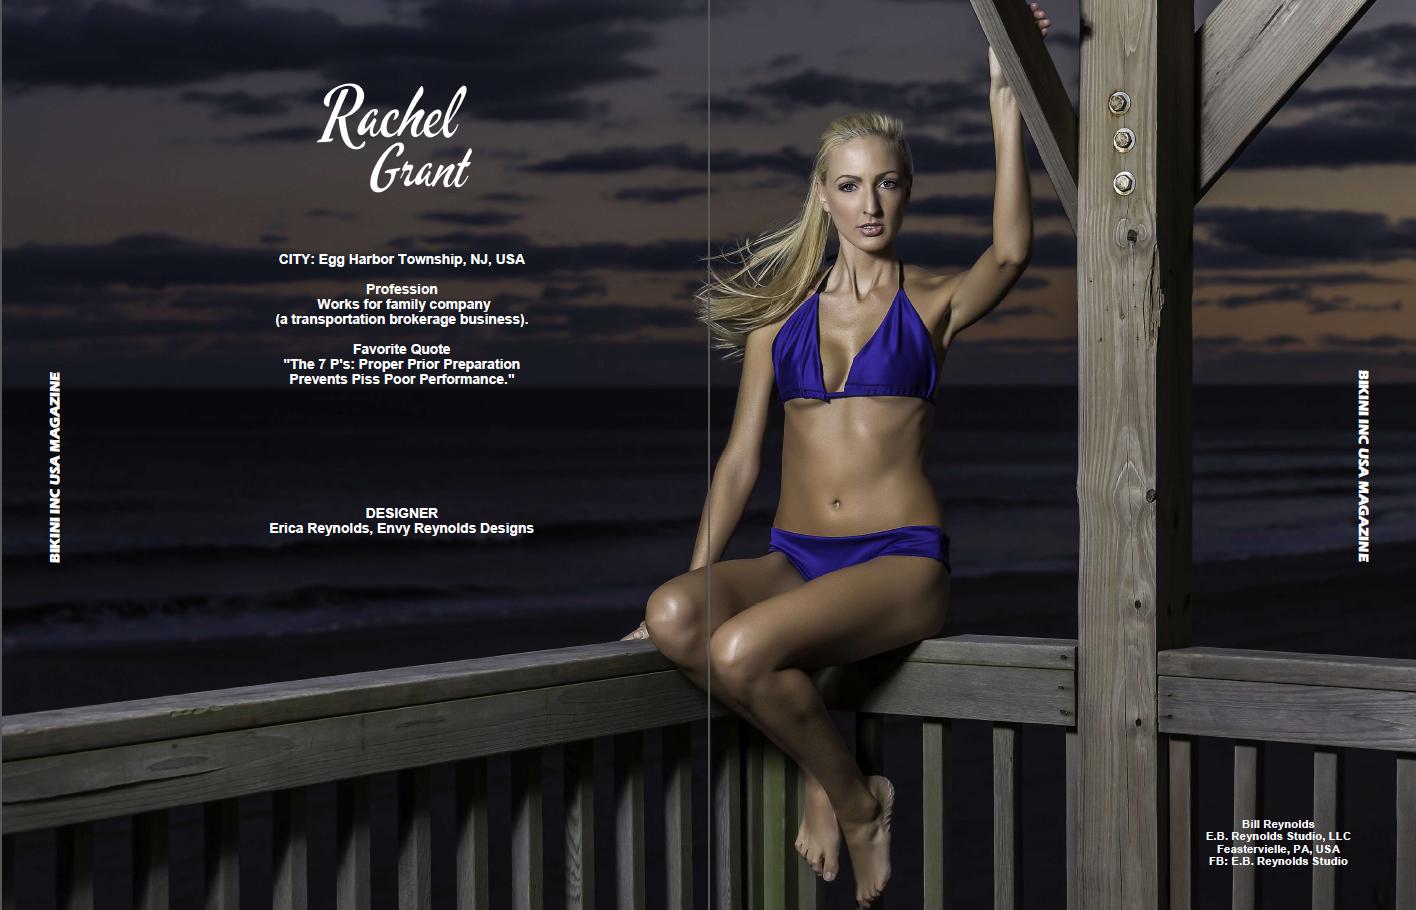 Rachel Grant - Jan 2018